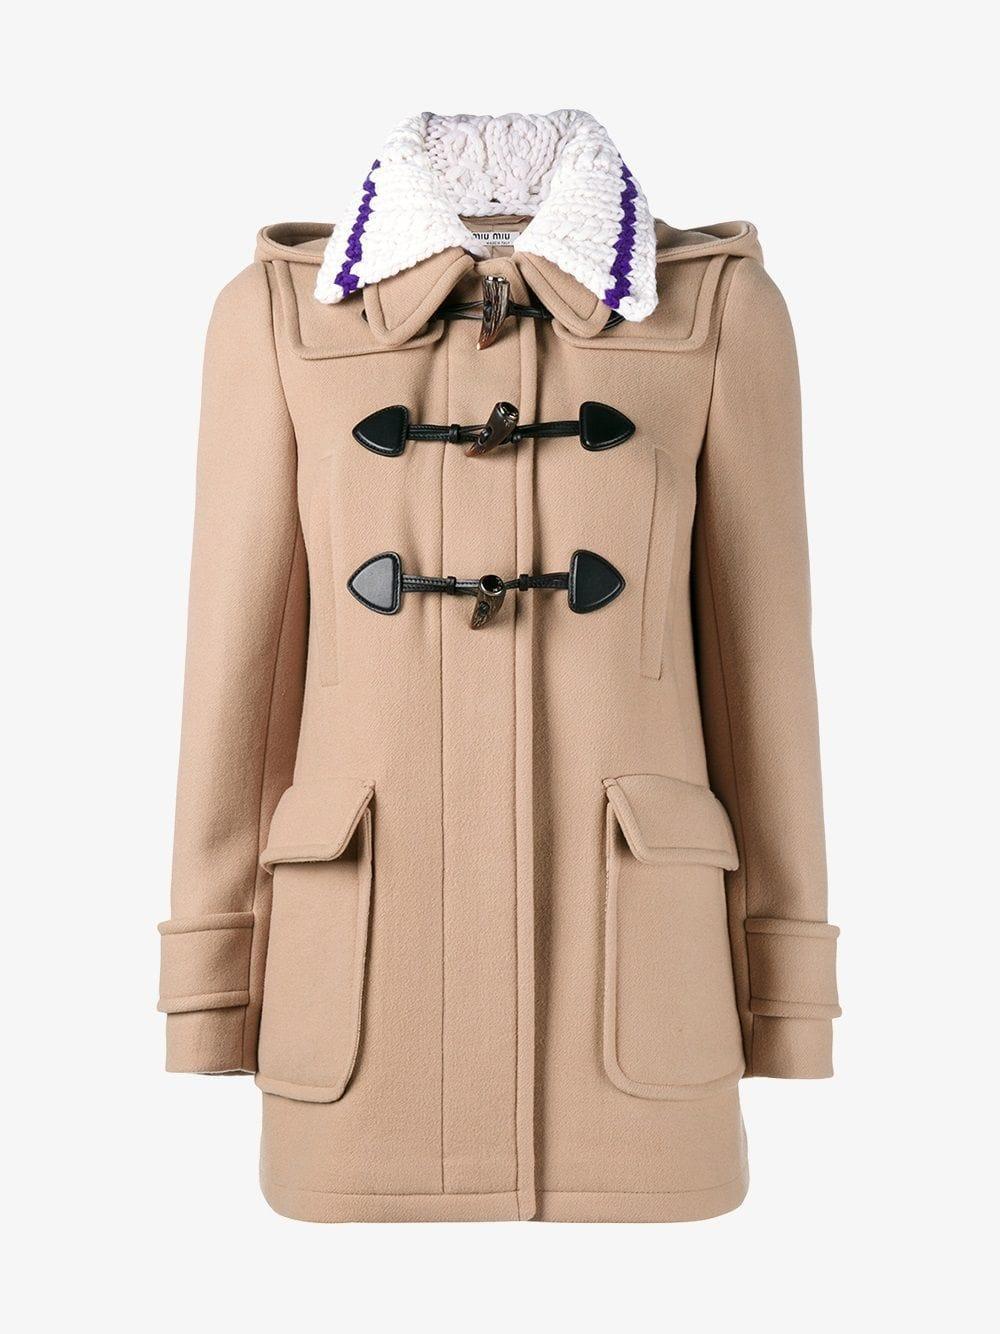 3baff25a3cd3 Lyst - Miu Miu - Short Duffle Coat - Women - Calf Leather/viscose ...